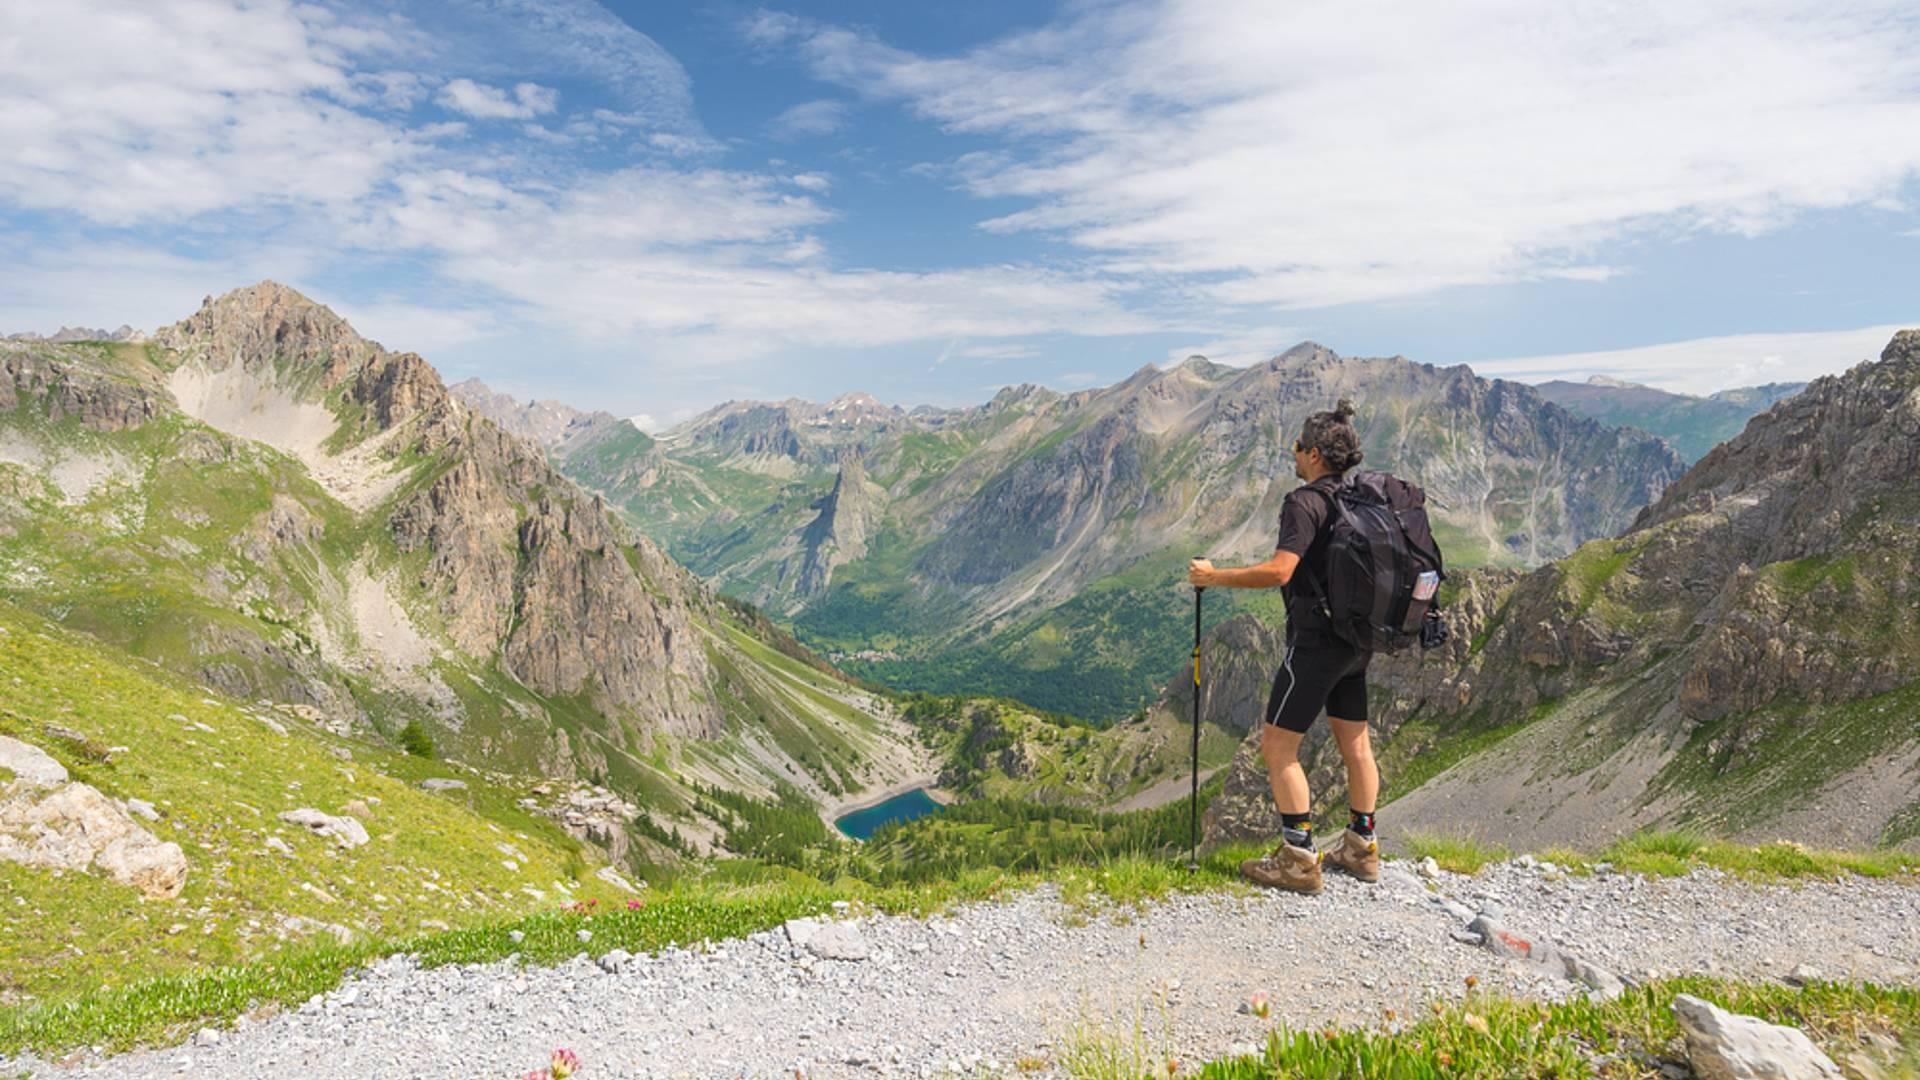 Rando, VTT, escalade... les Alpes en été, version sensations -